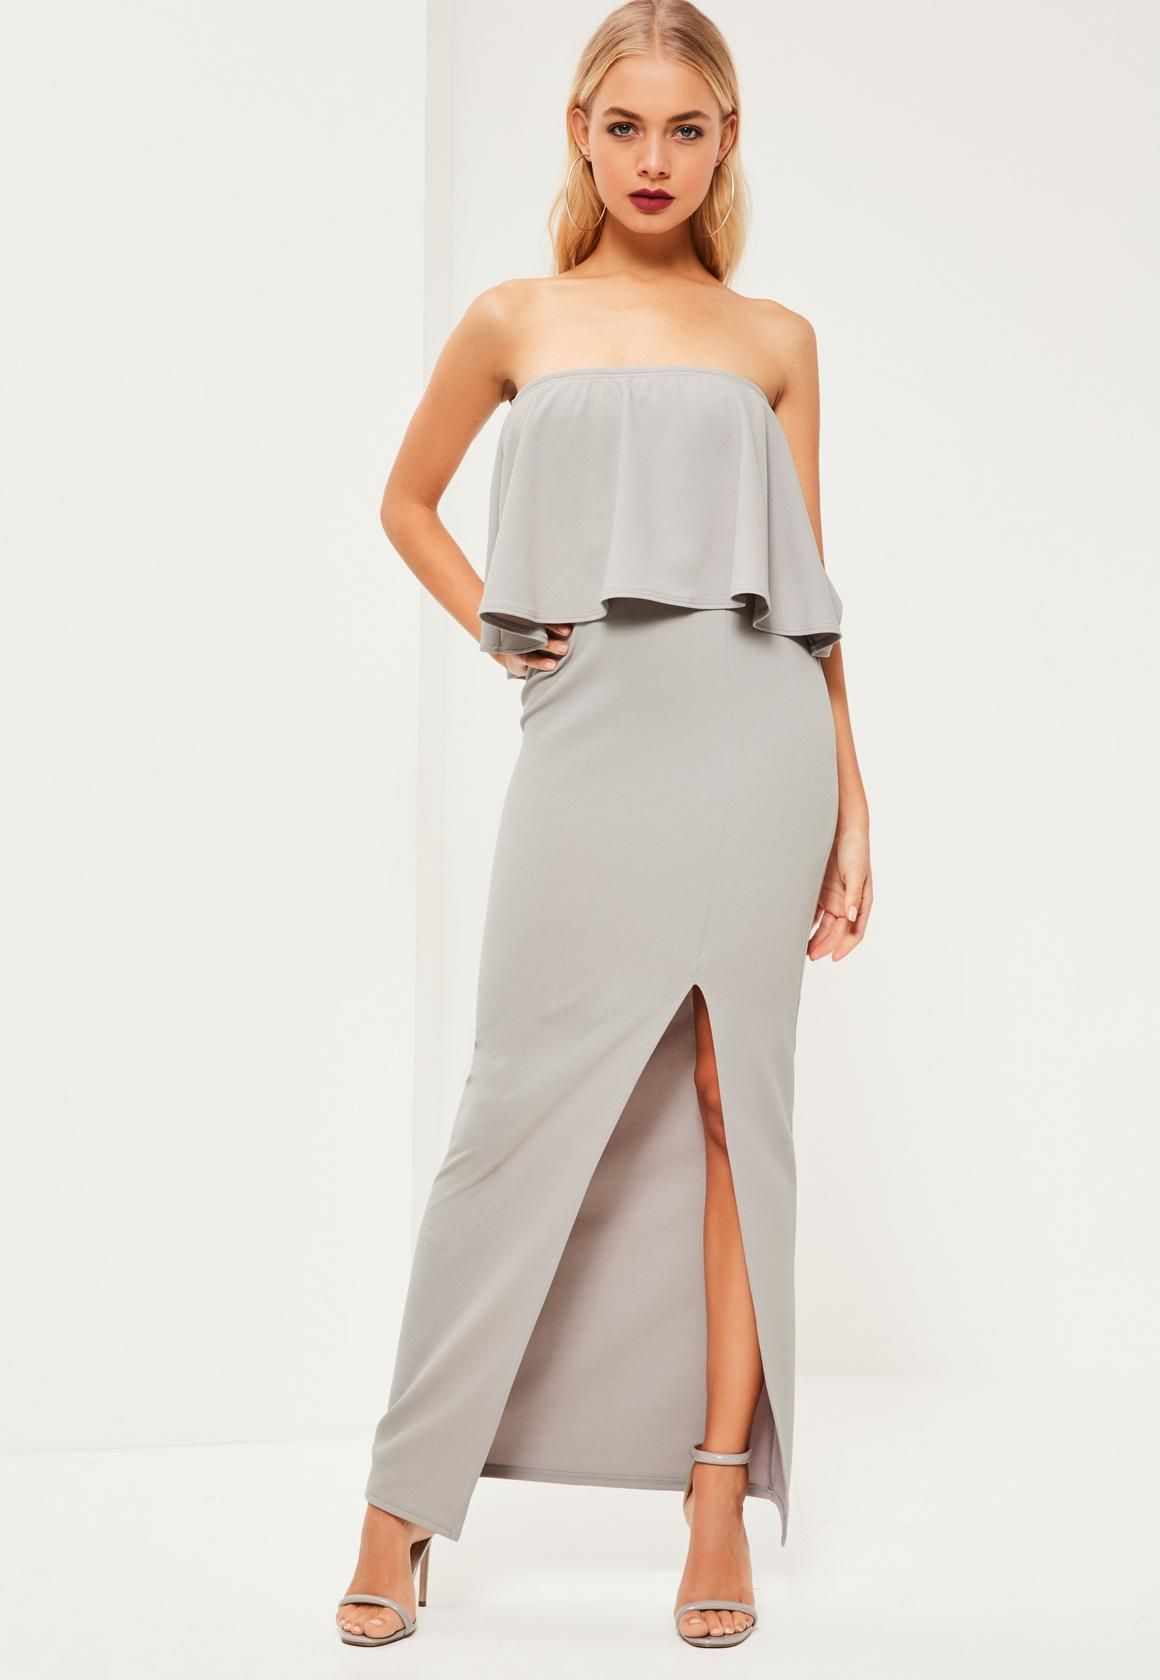 Missguided - Grey Crepe Frill Side Split Maxi Dress